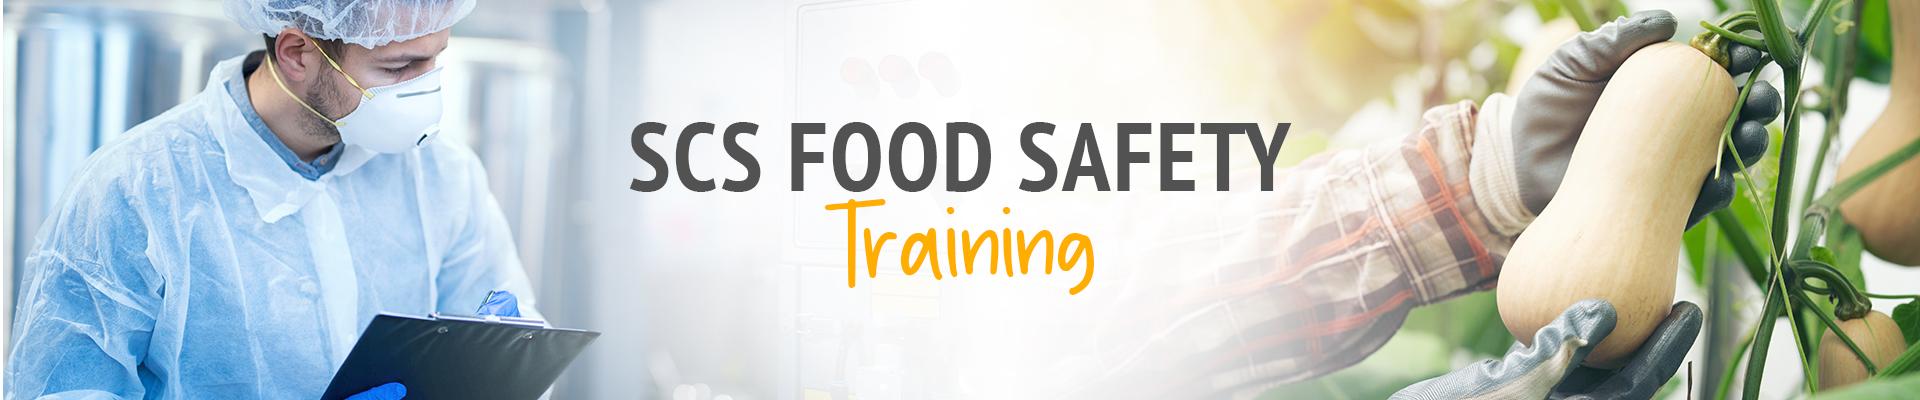 FoodSafetyTraining-Landing_banner